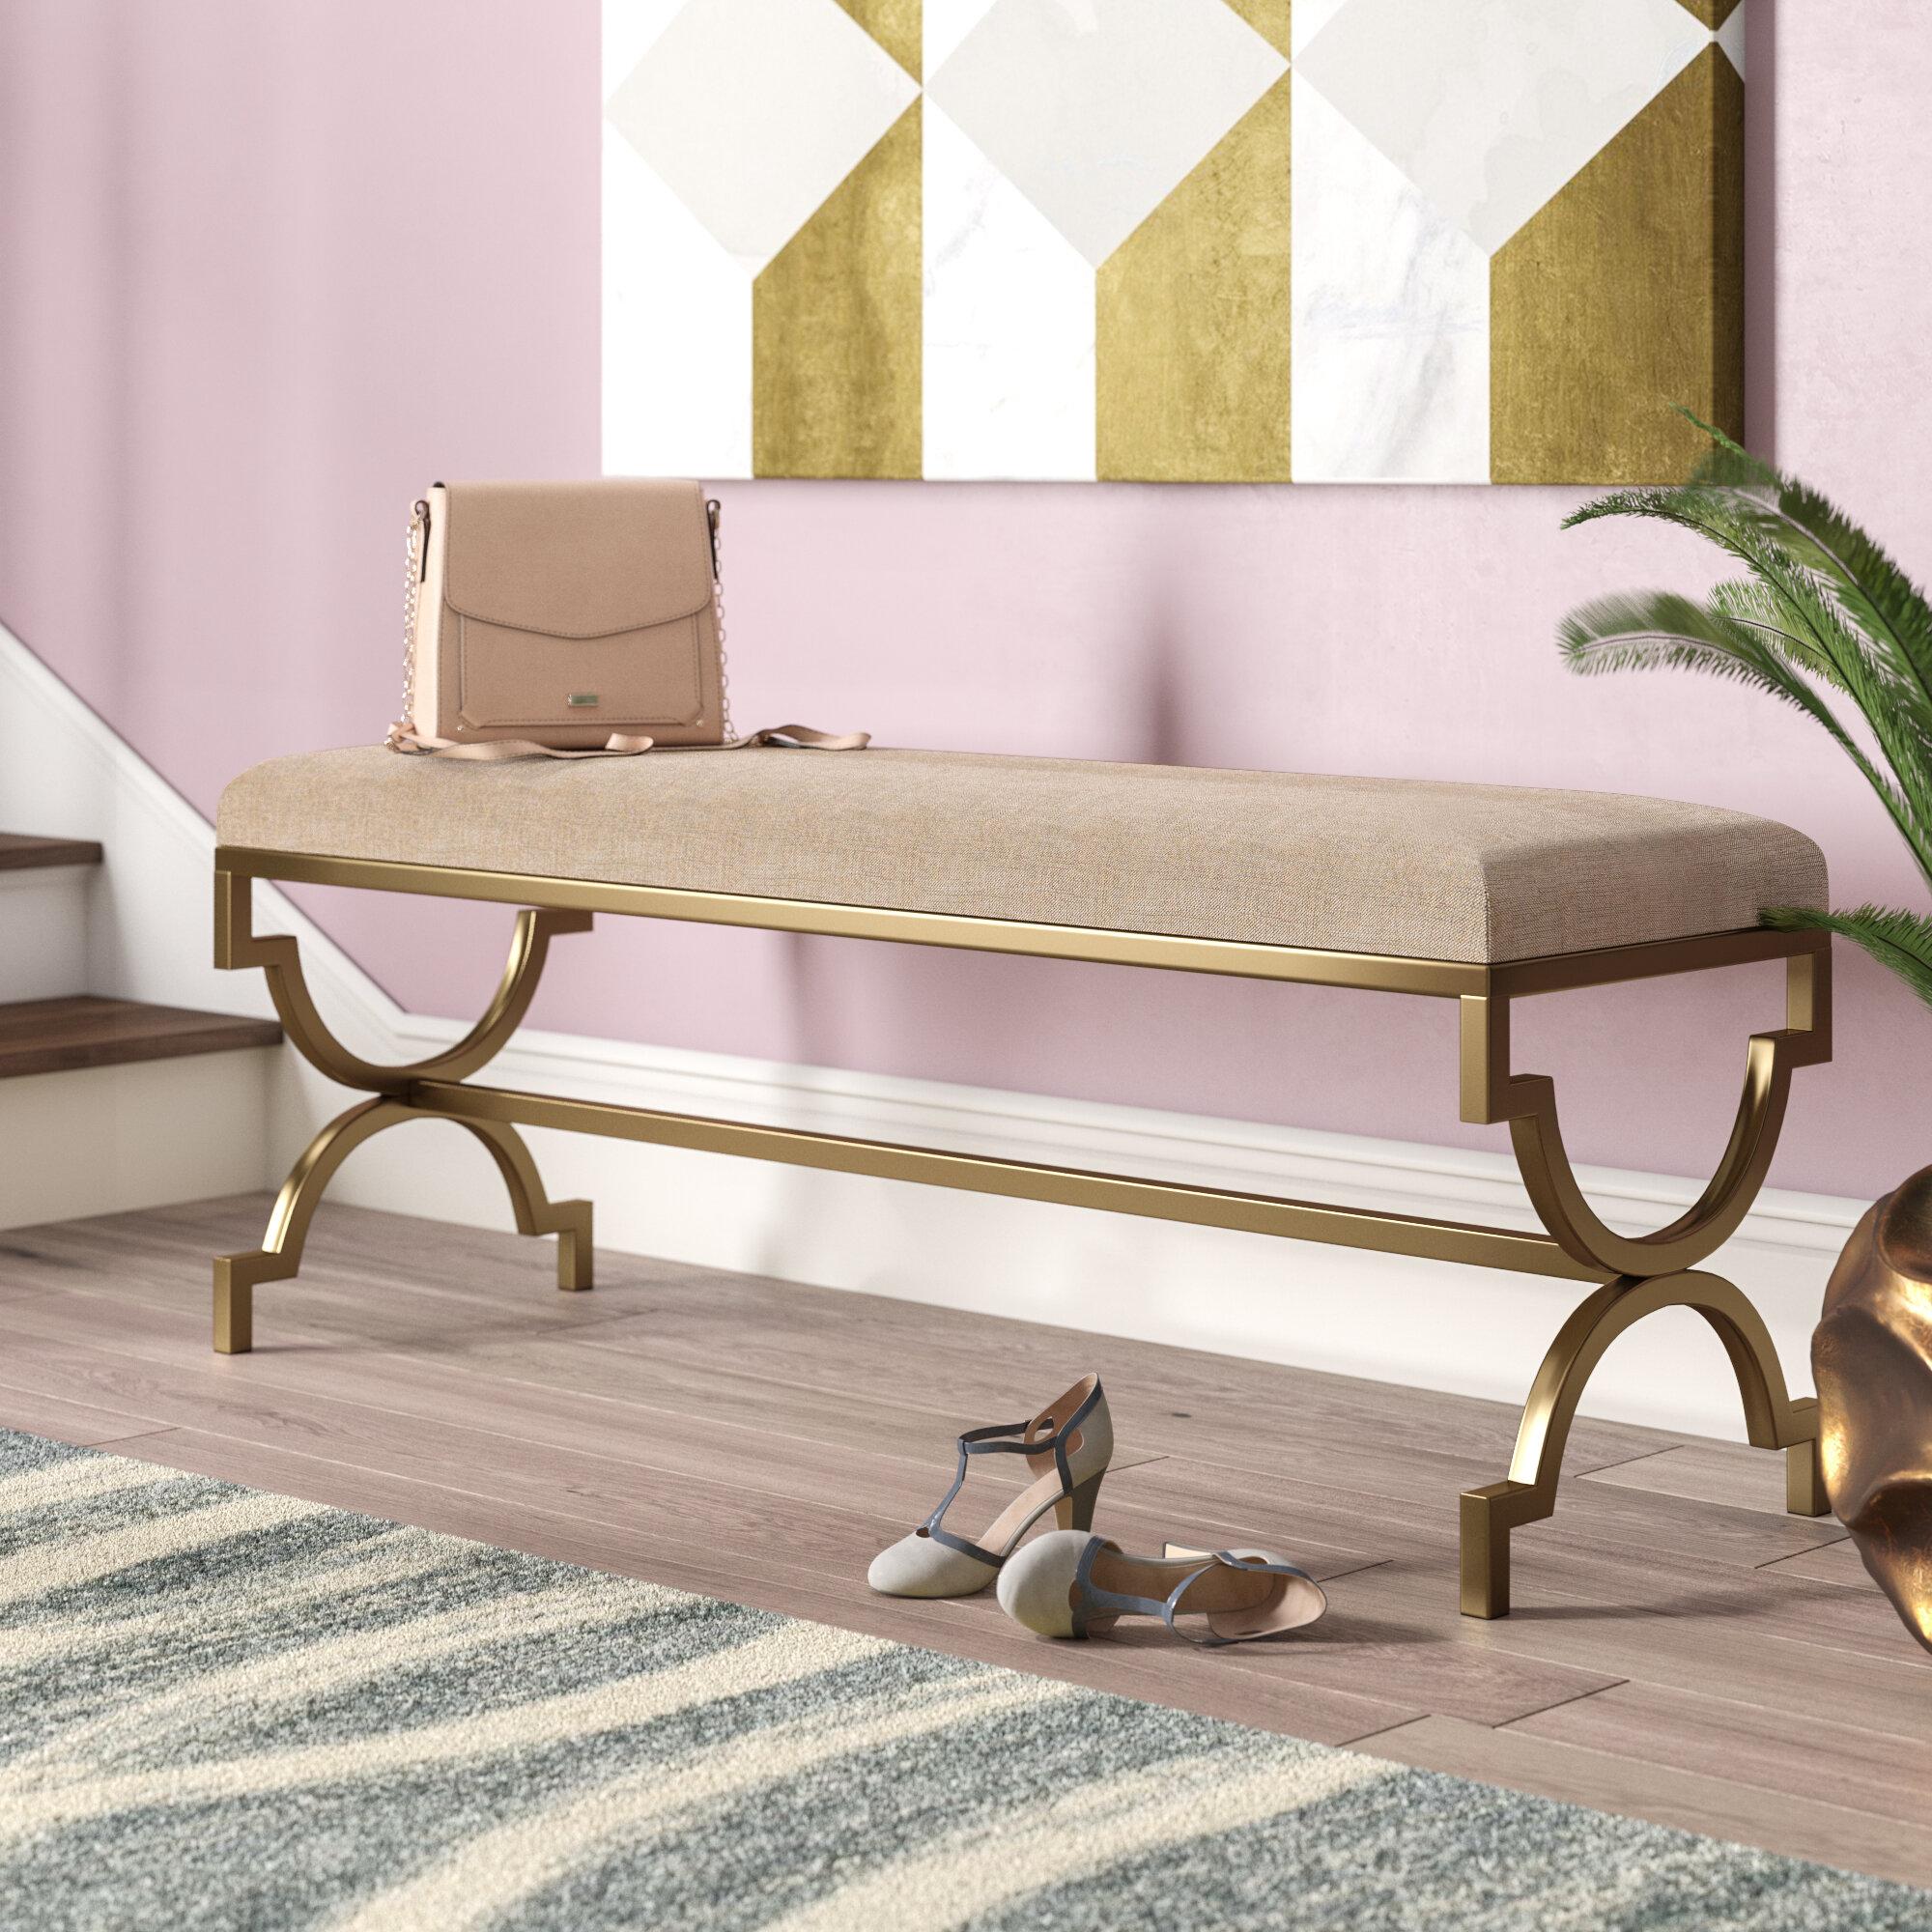 834864ba Willa Arlo Interiors Zara Metal/Upholstered Bench & Reviews   Wayfair